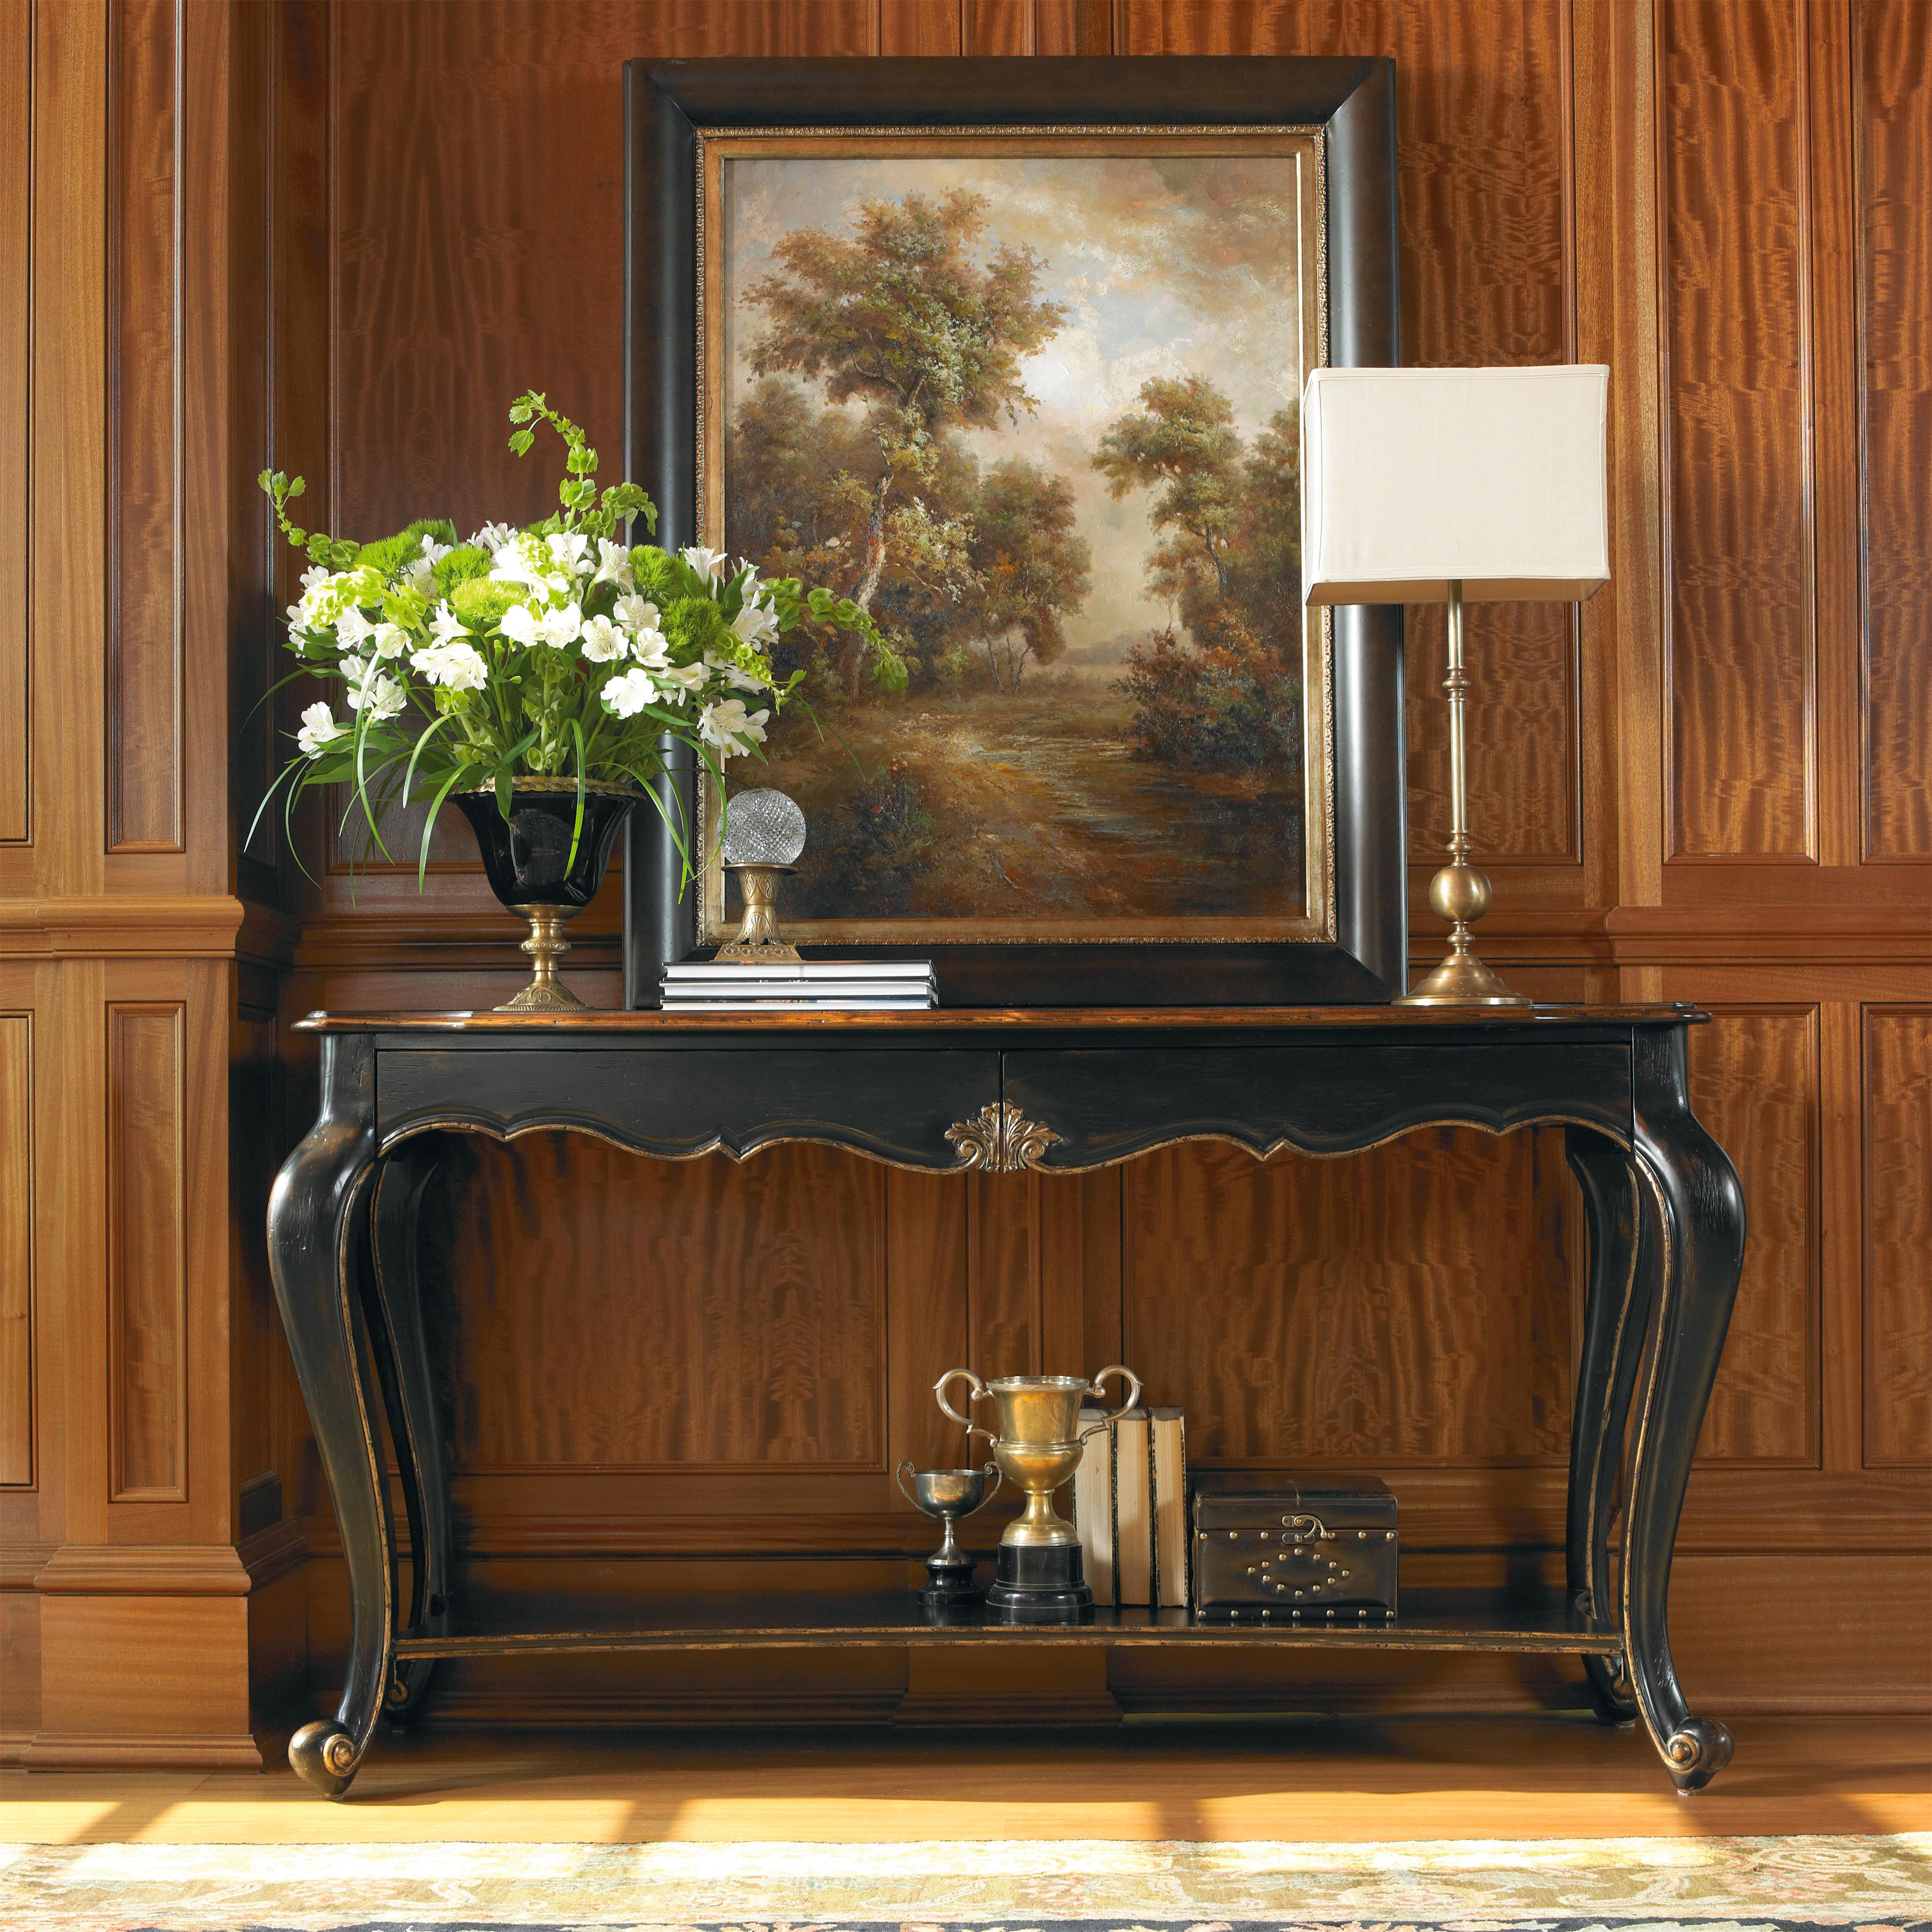 Grandover (5029) By Hooker Furniture   Adcock Furniture   Hooker Furniture  Grandover Dealer